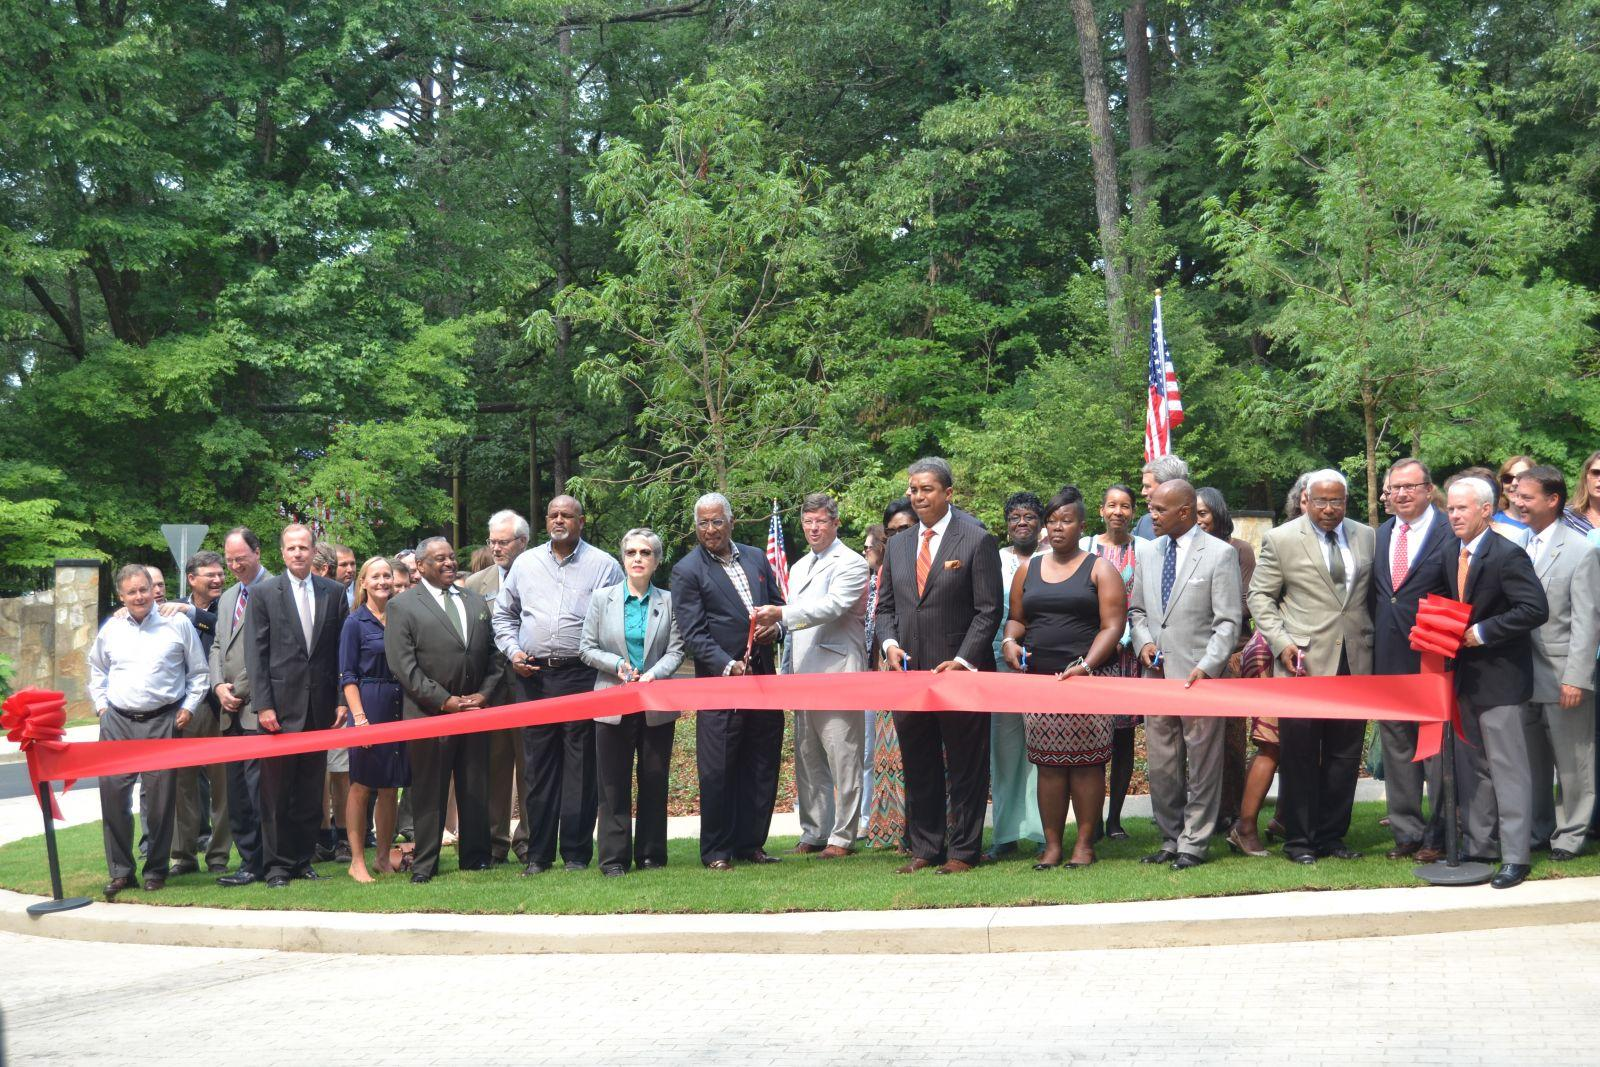 Friends Of Birmingham Botanical Gardens To Invest More Than $700,000 In Garden  Improvements